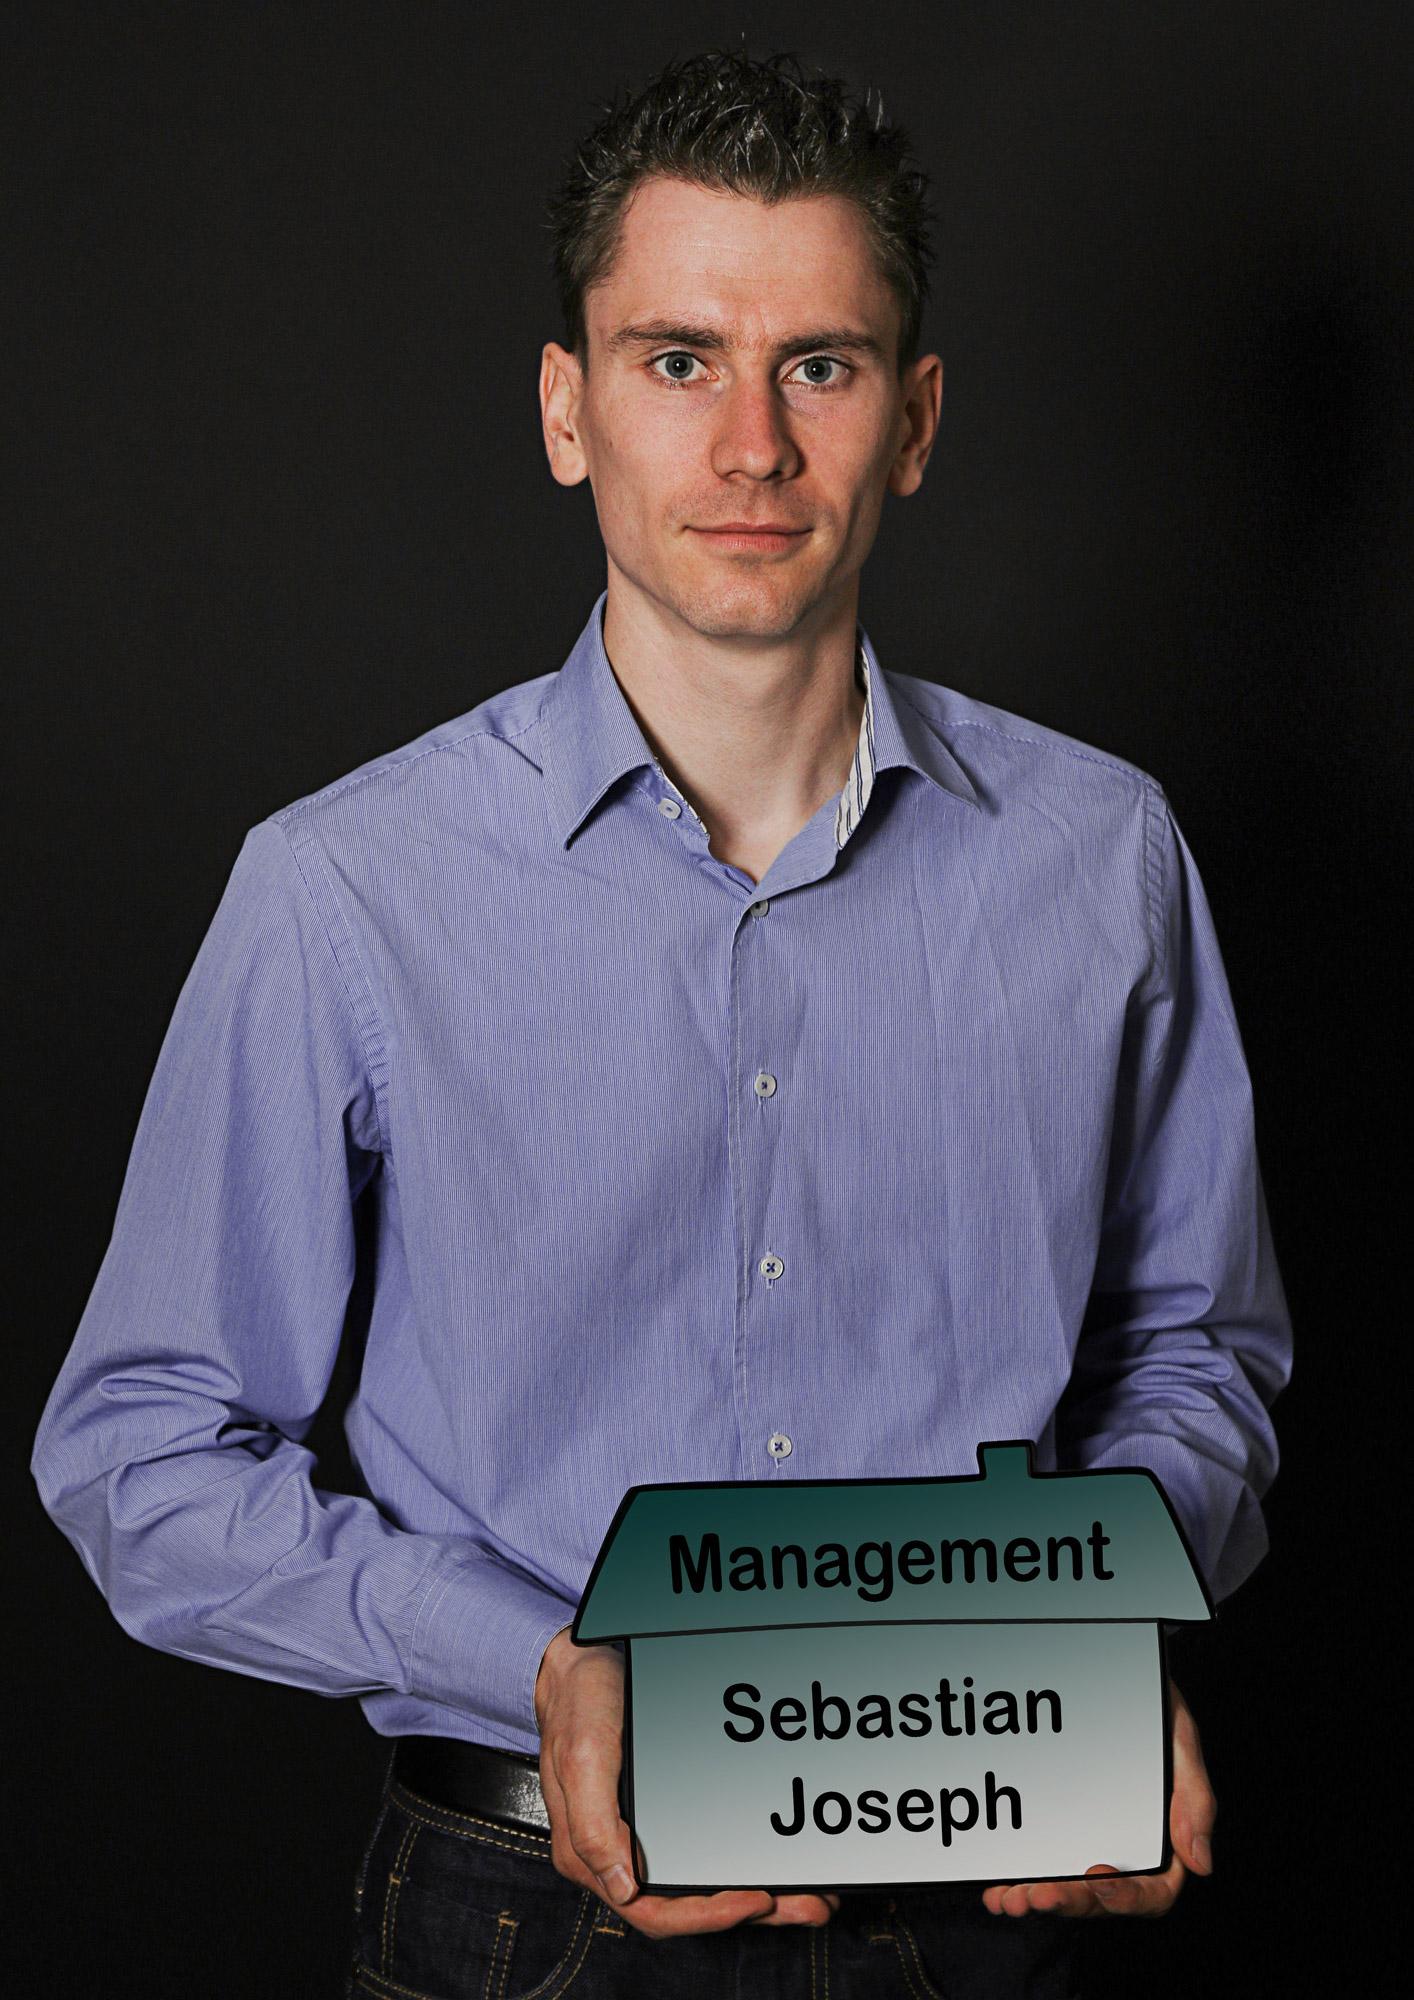 Management Sebastian Joseph